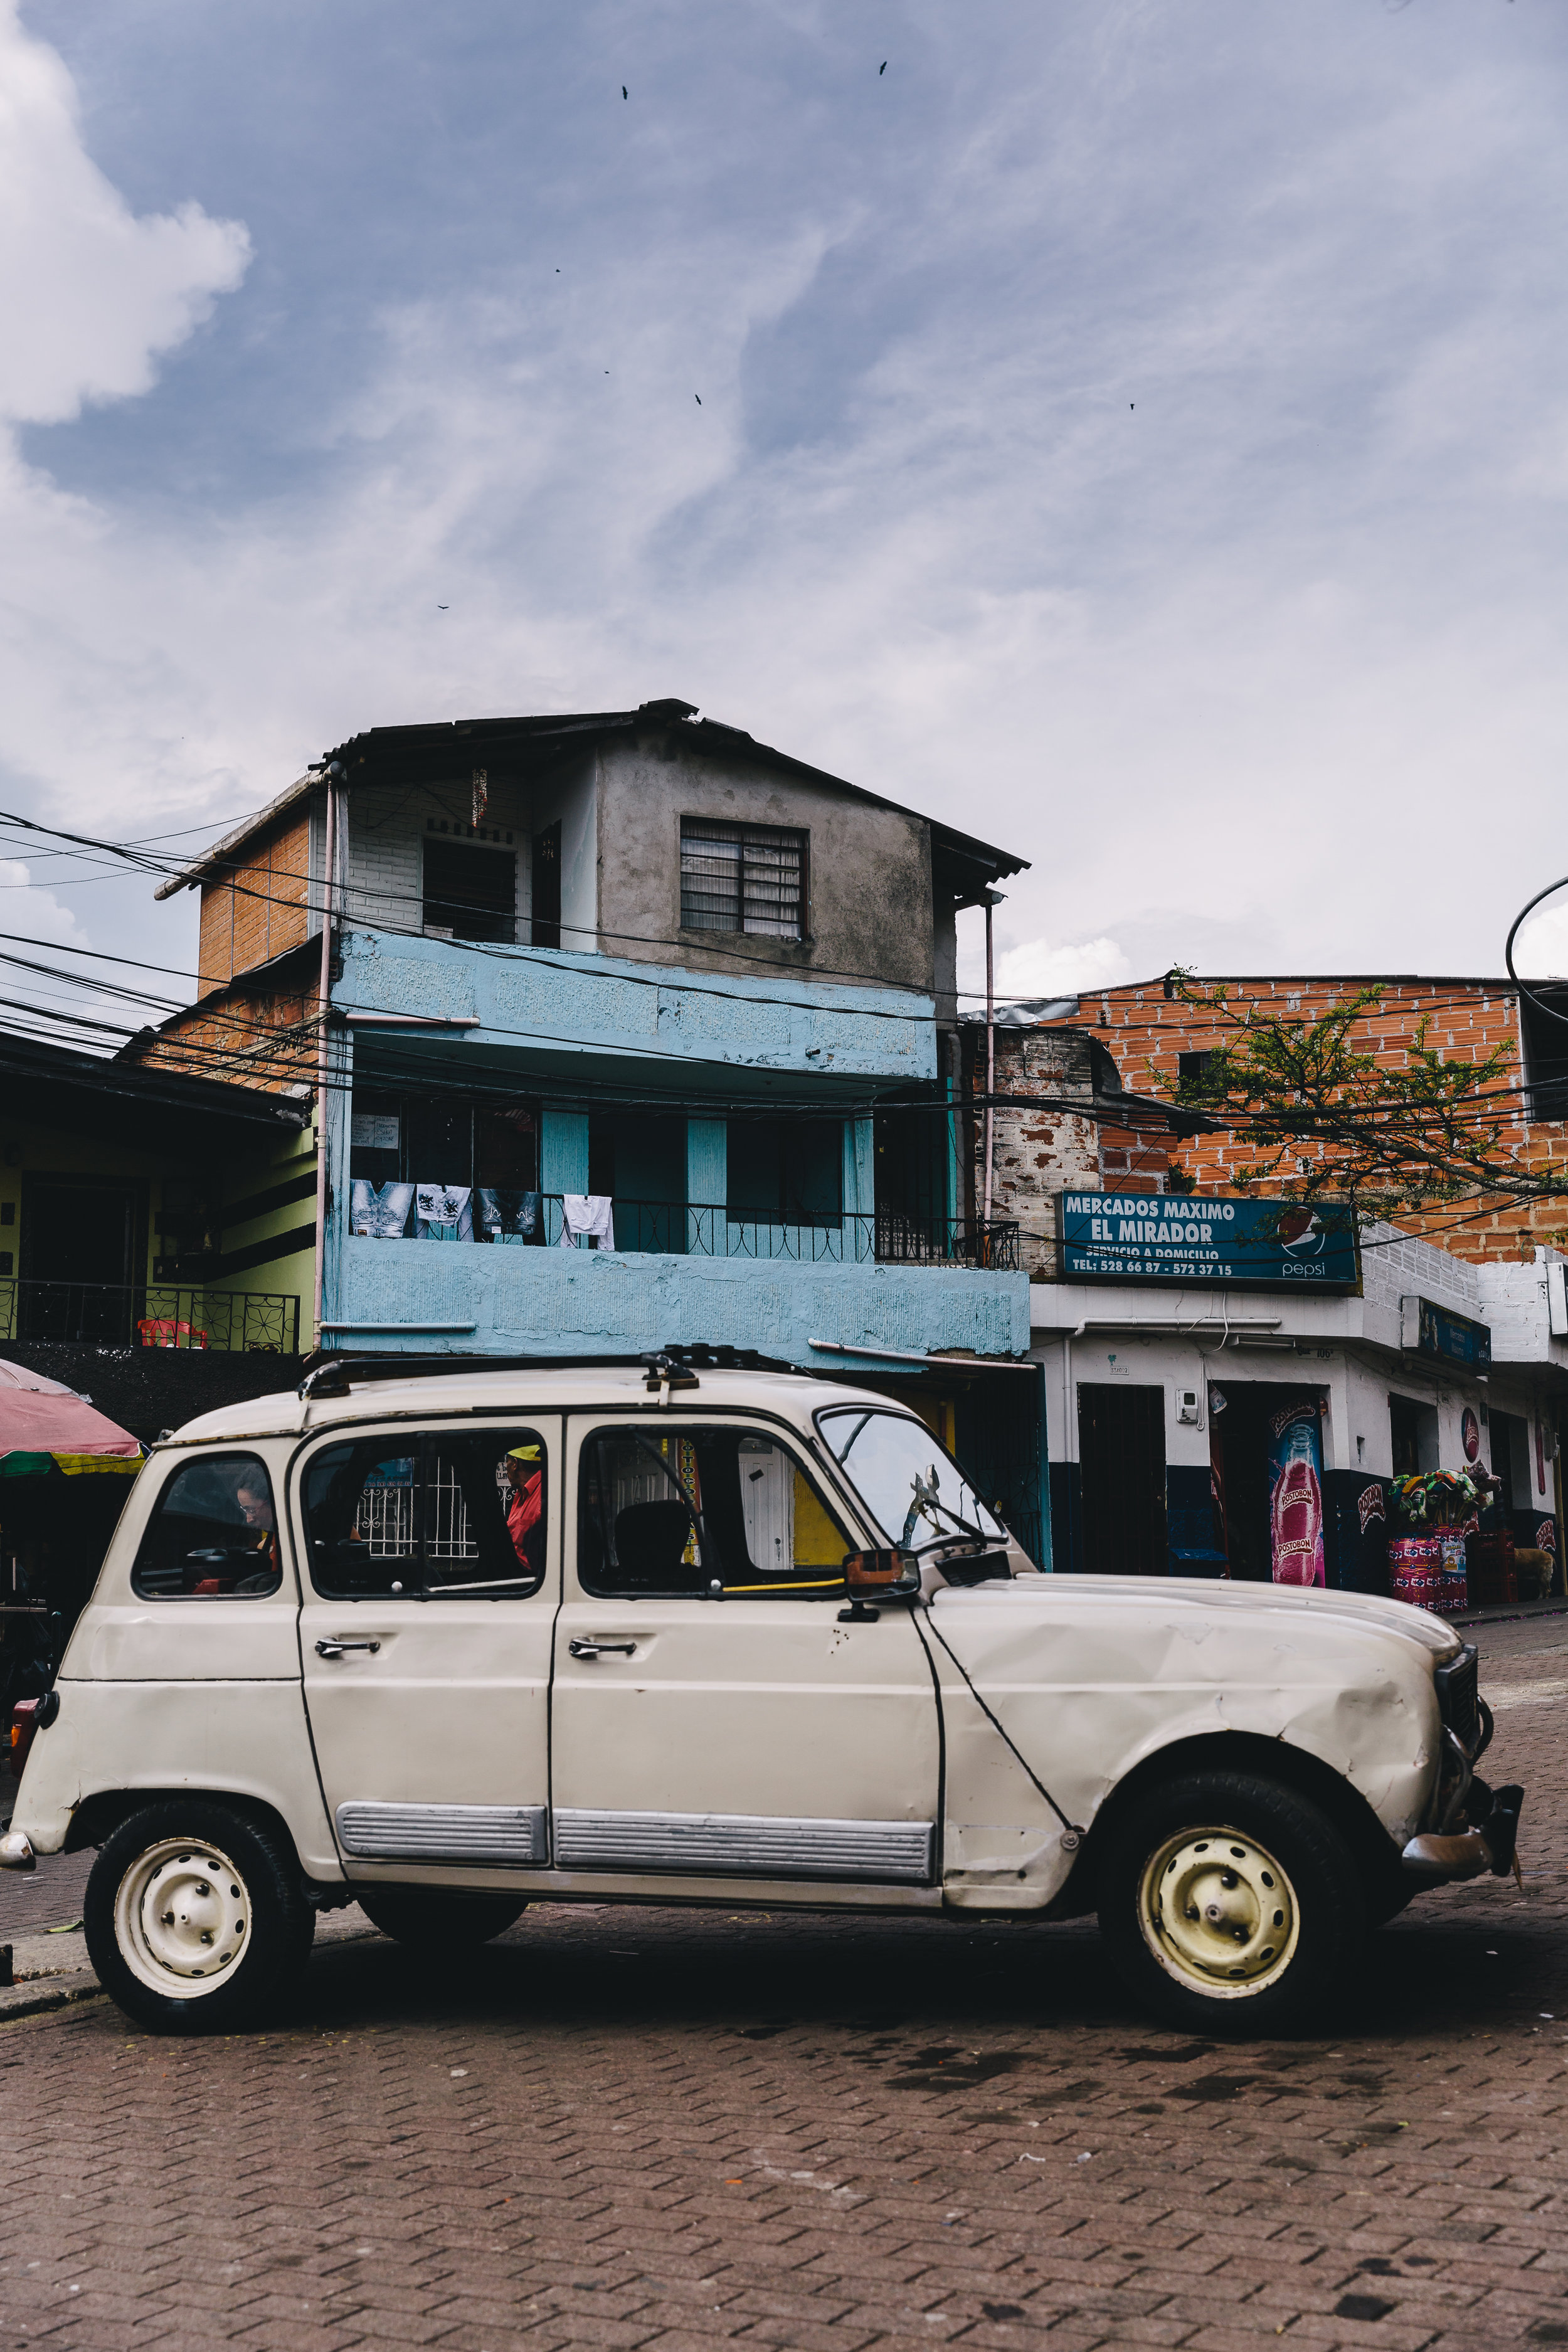 Melissa_Findley-KATHMANDU-Colombia-16